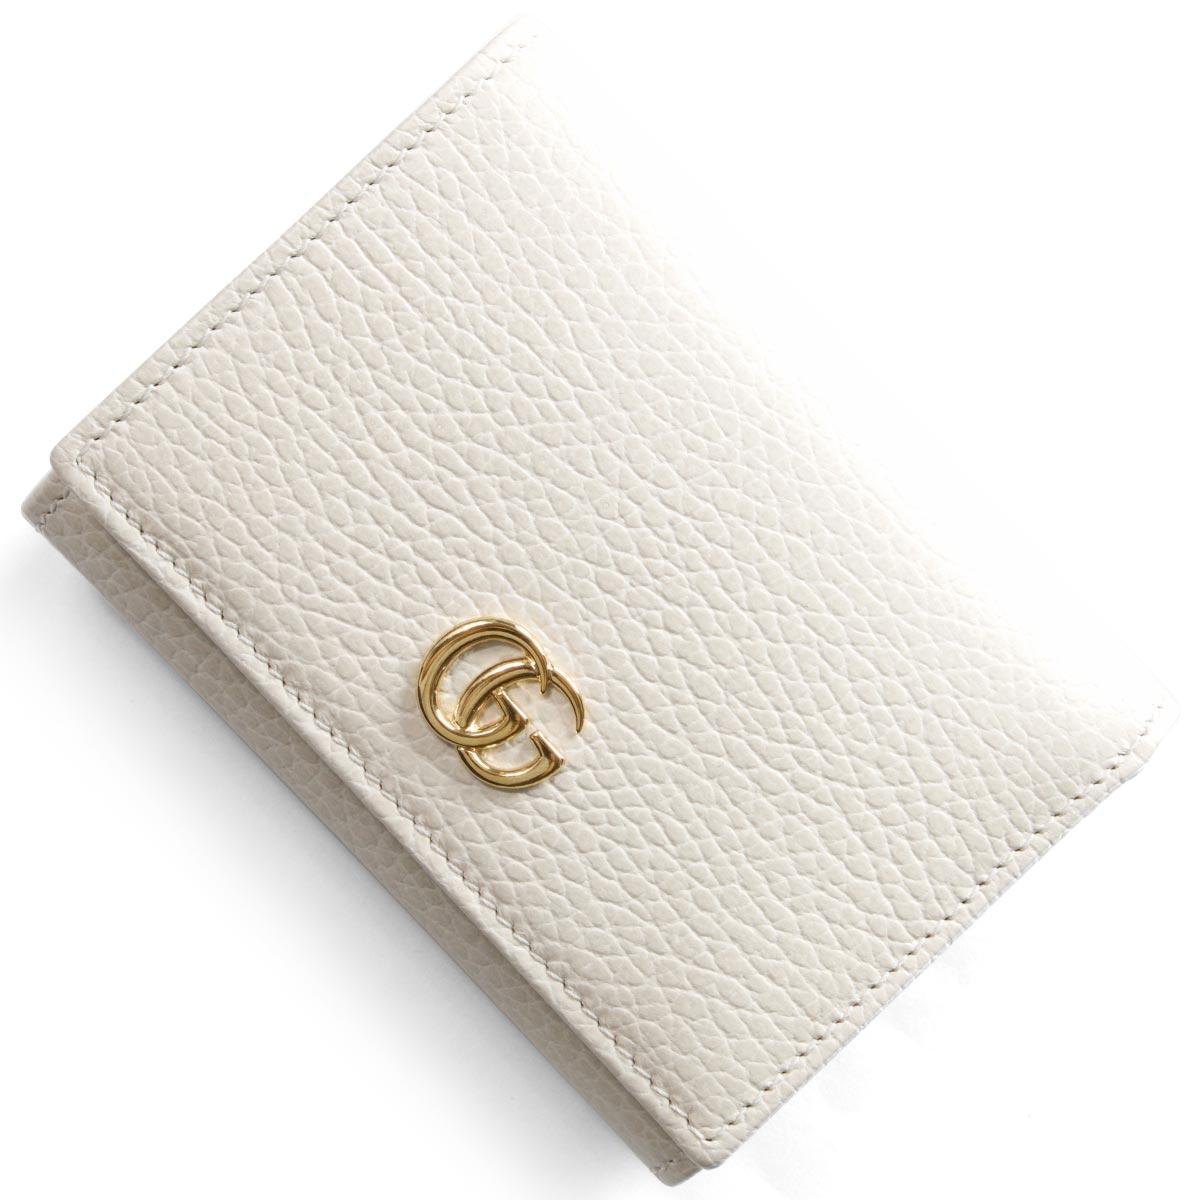 6efe53fa66b7 グッチ 三つ折り財布 財布 レディース プチマーモント オフホワイト 474746 CAO0G 9022 GUCCI